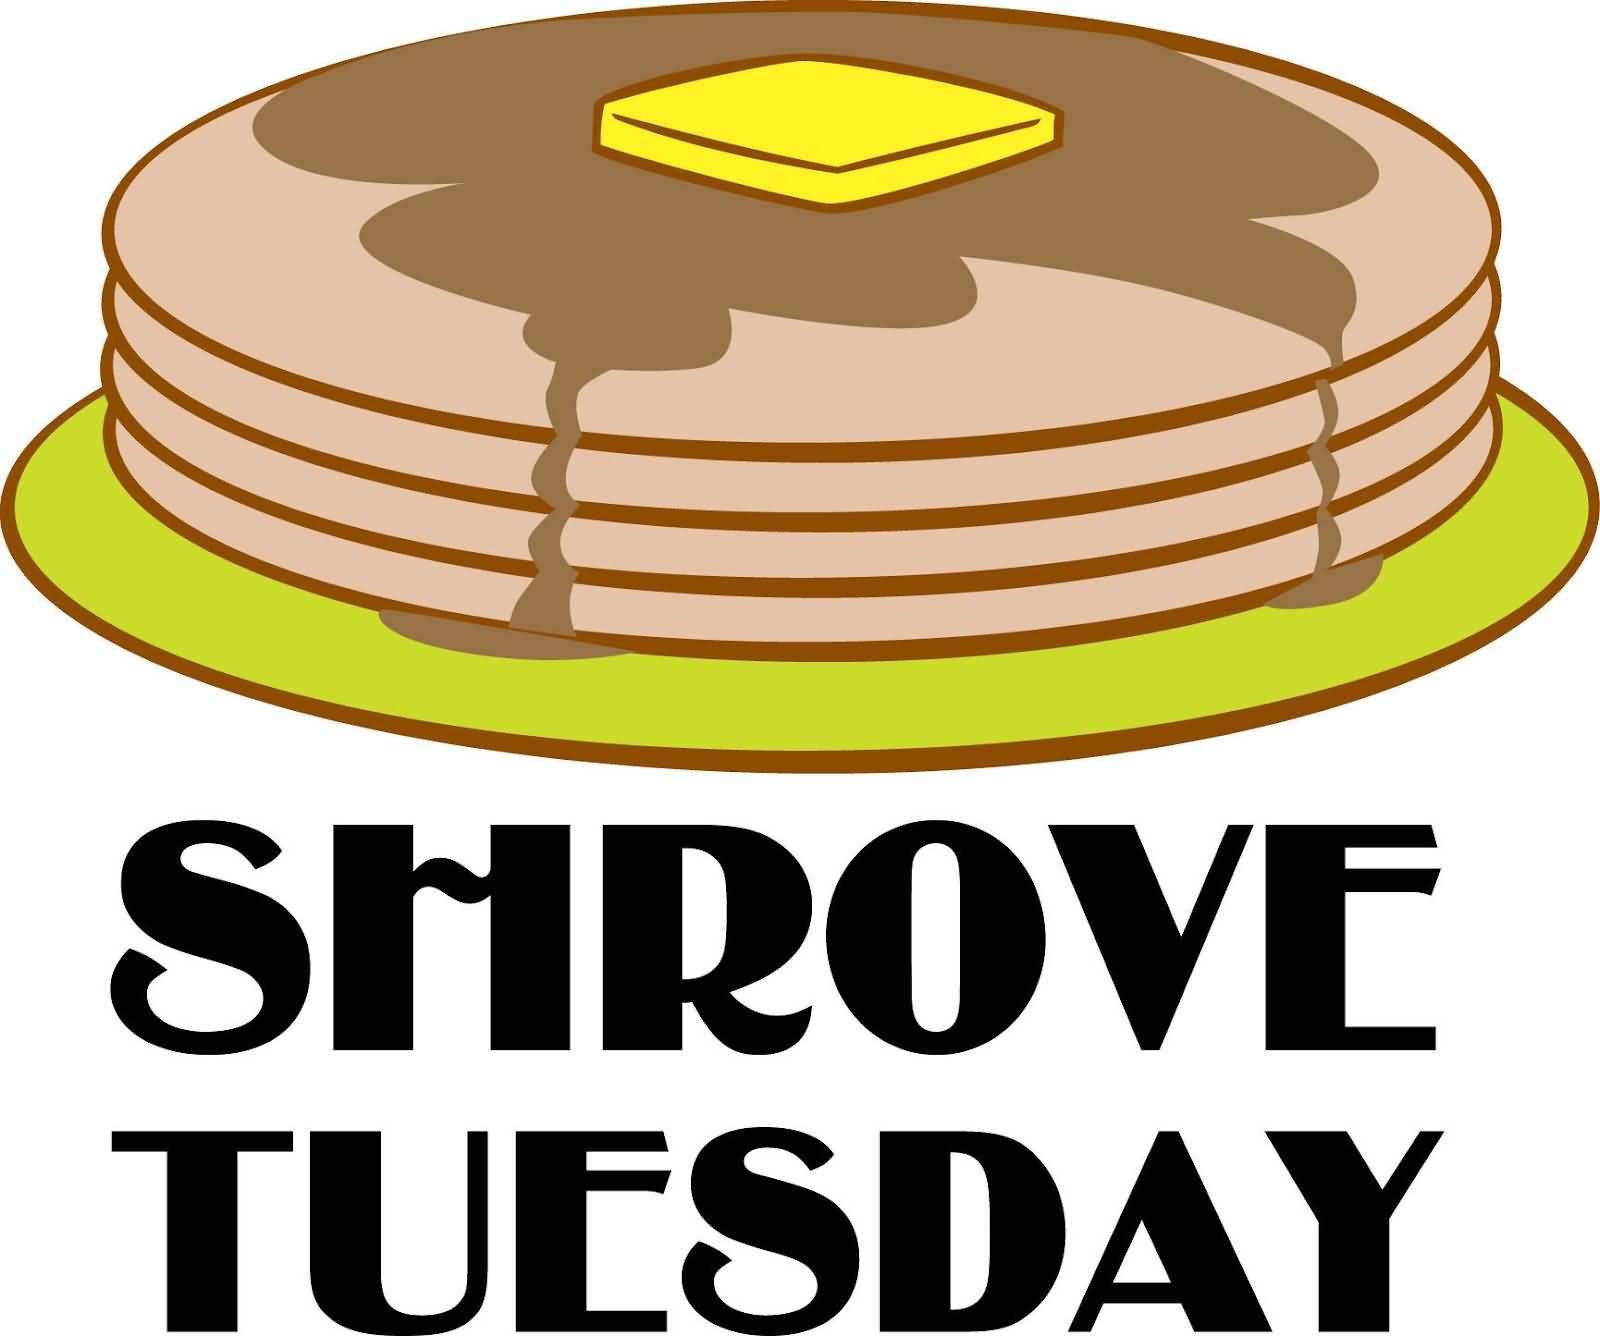 Shrove tuesday . Pancake clipart